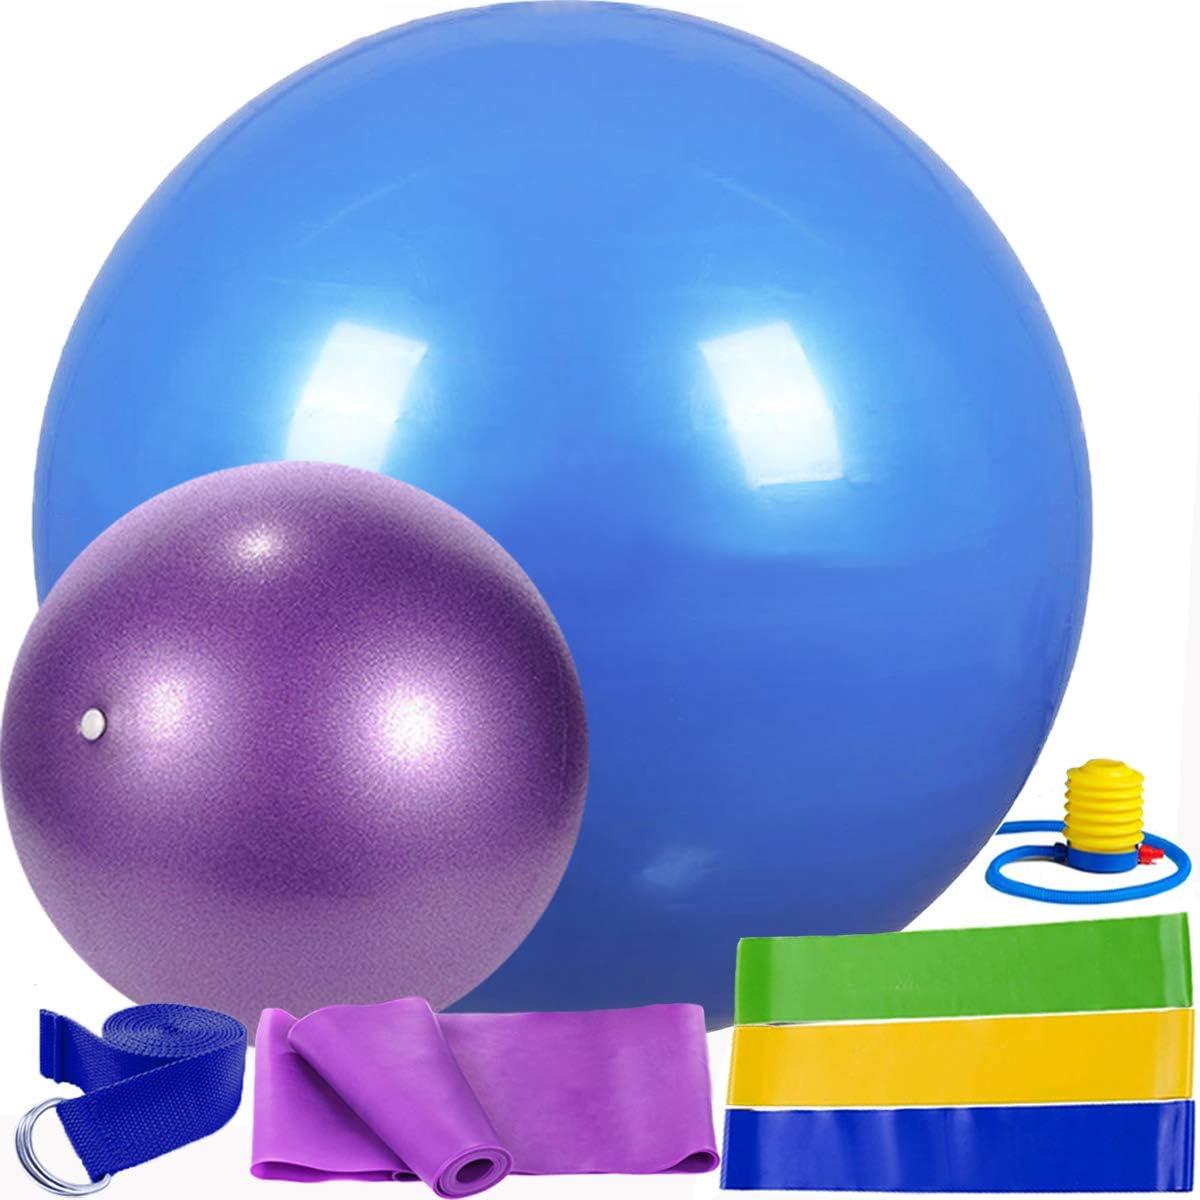 Yoga Ball Set 8 PCs 3PCs Workout Exercise Ball